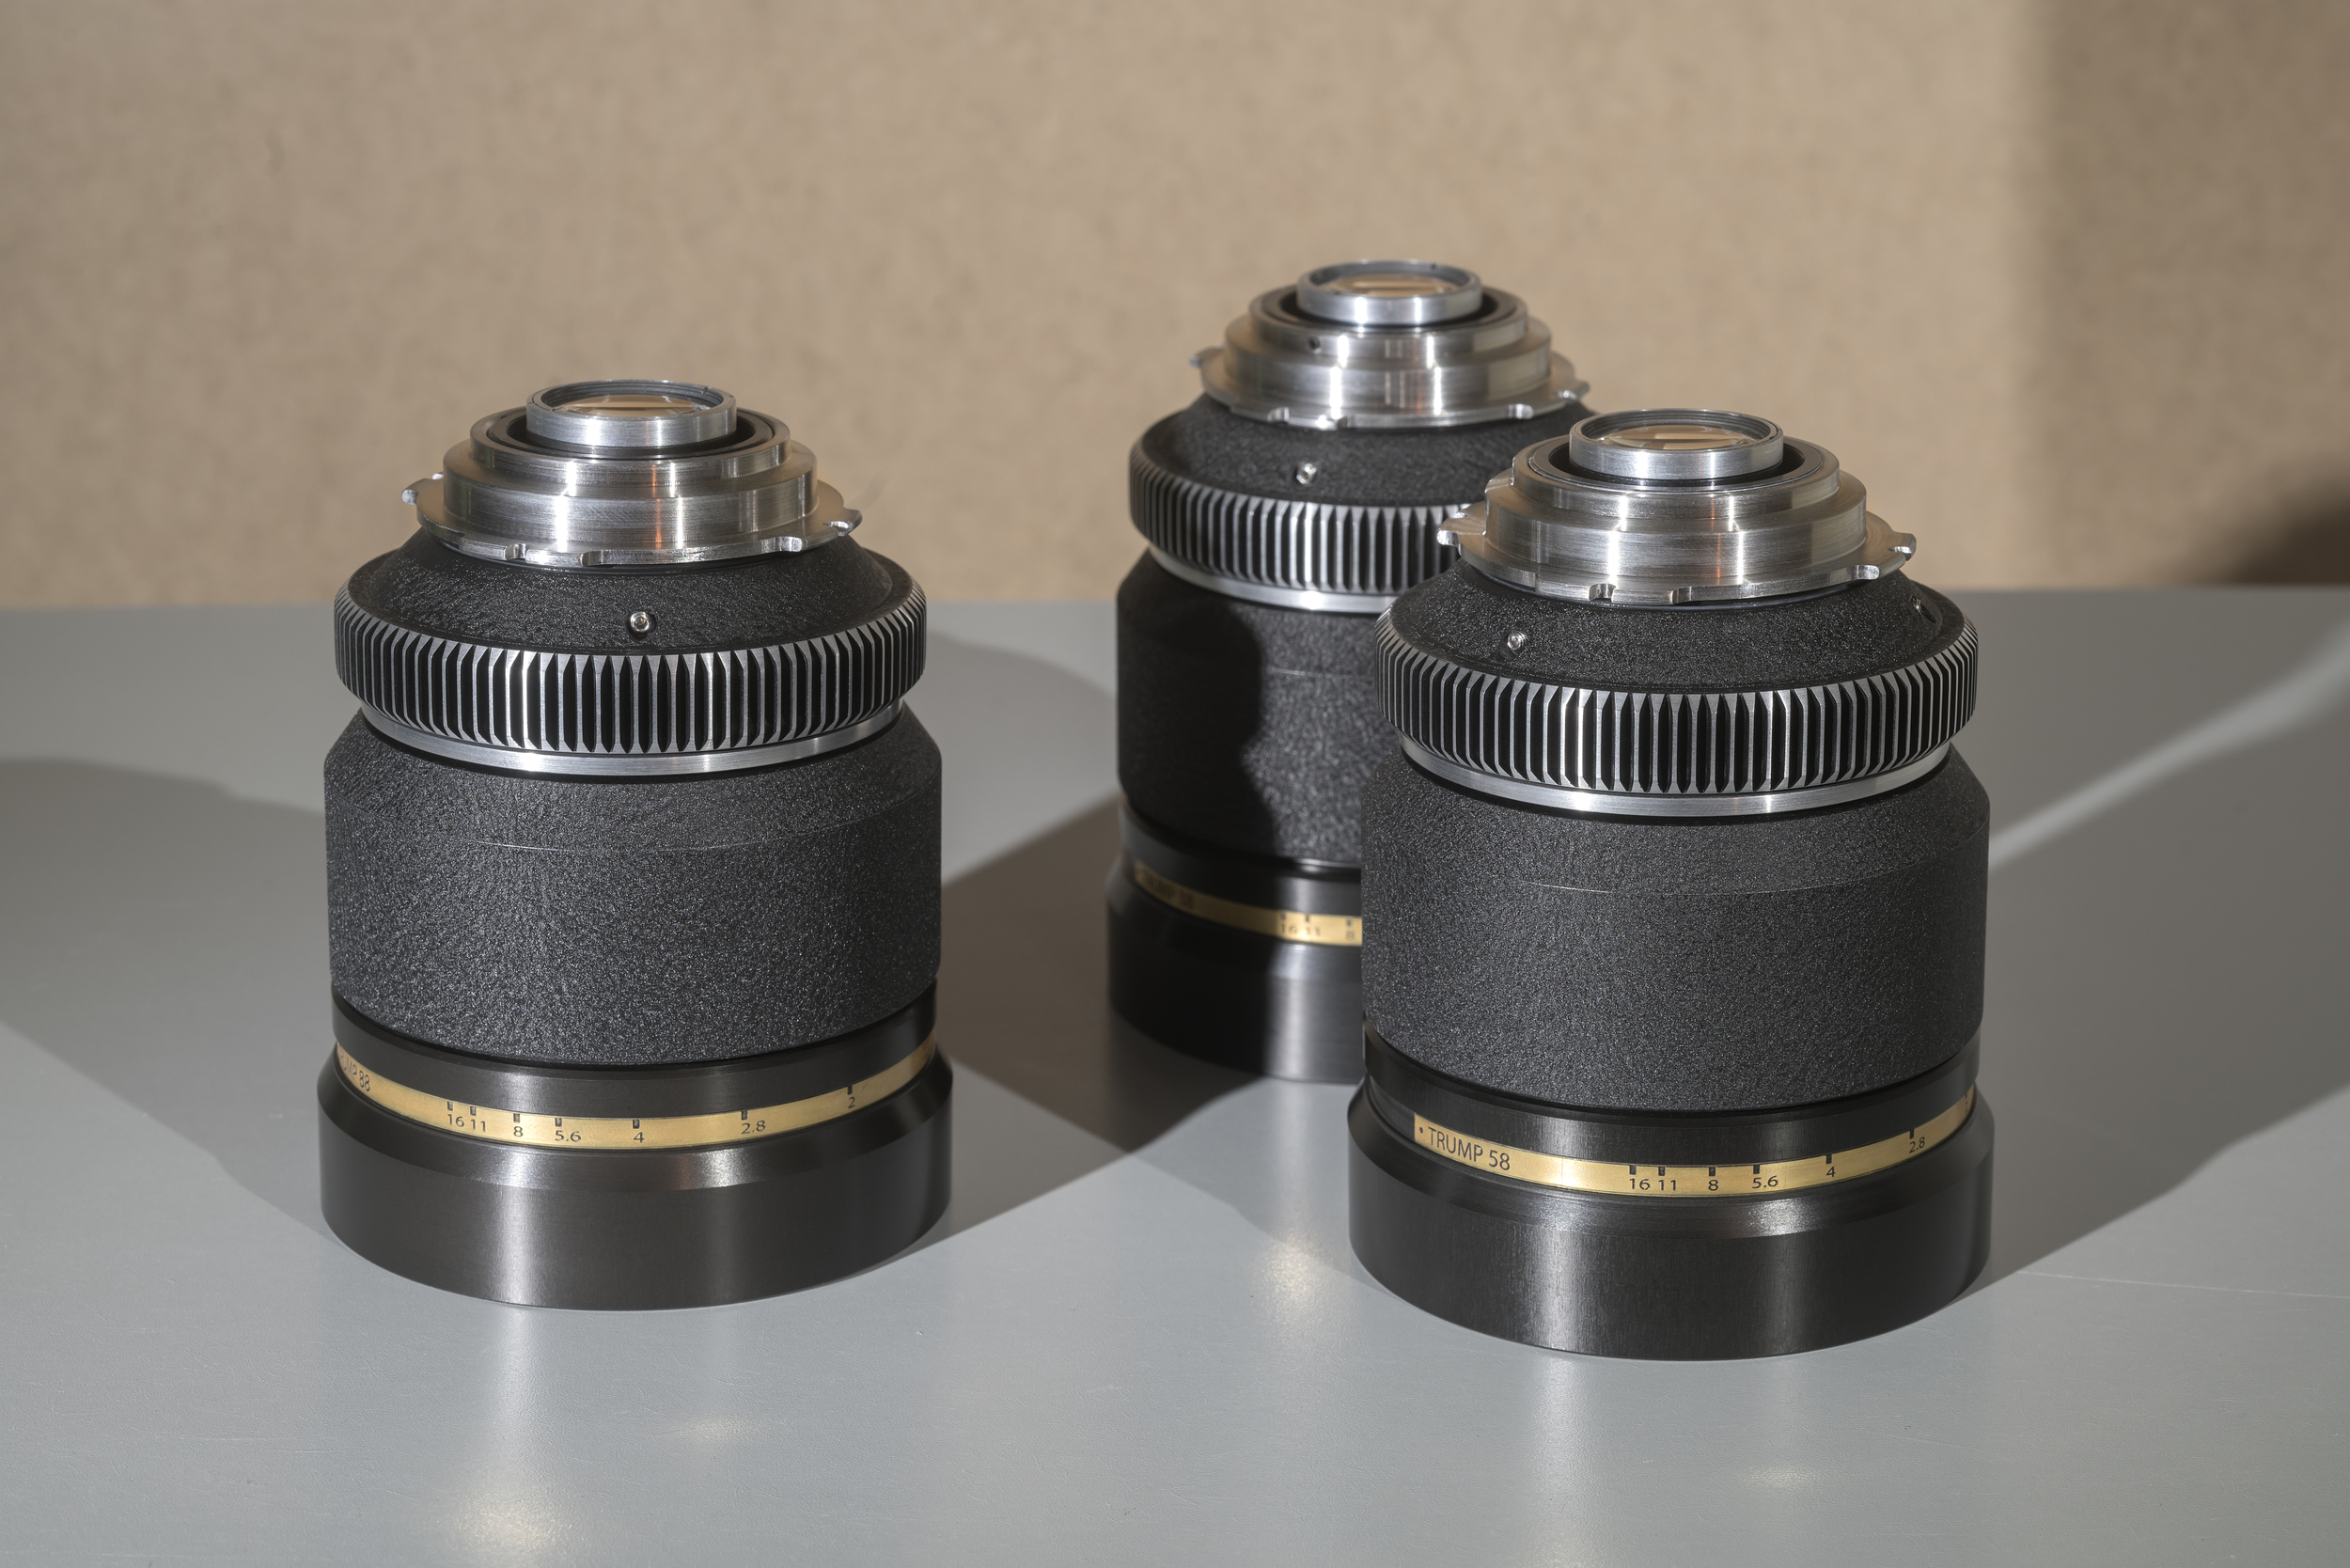 TRUMP 3 Lens Set - Graphite Black.jpg